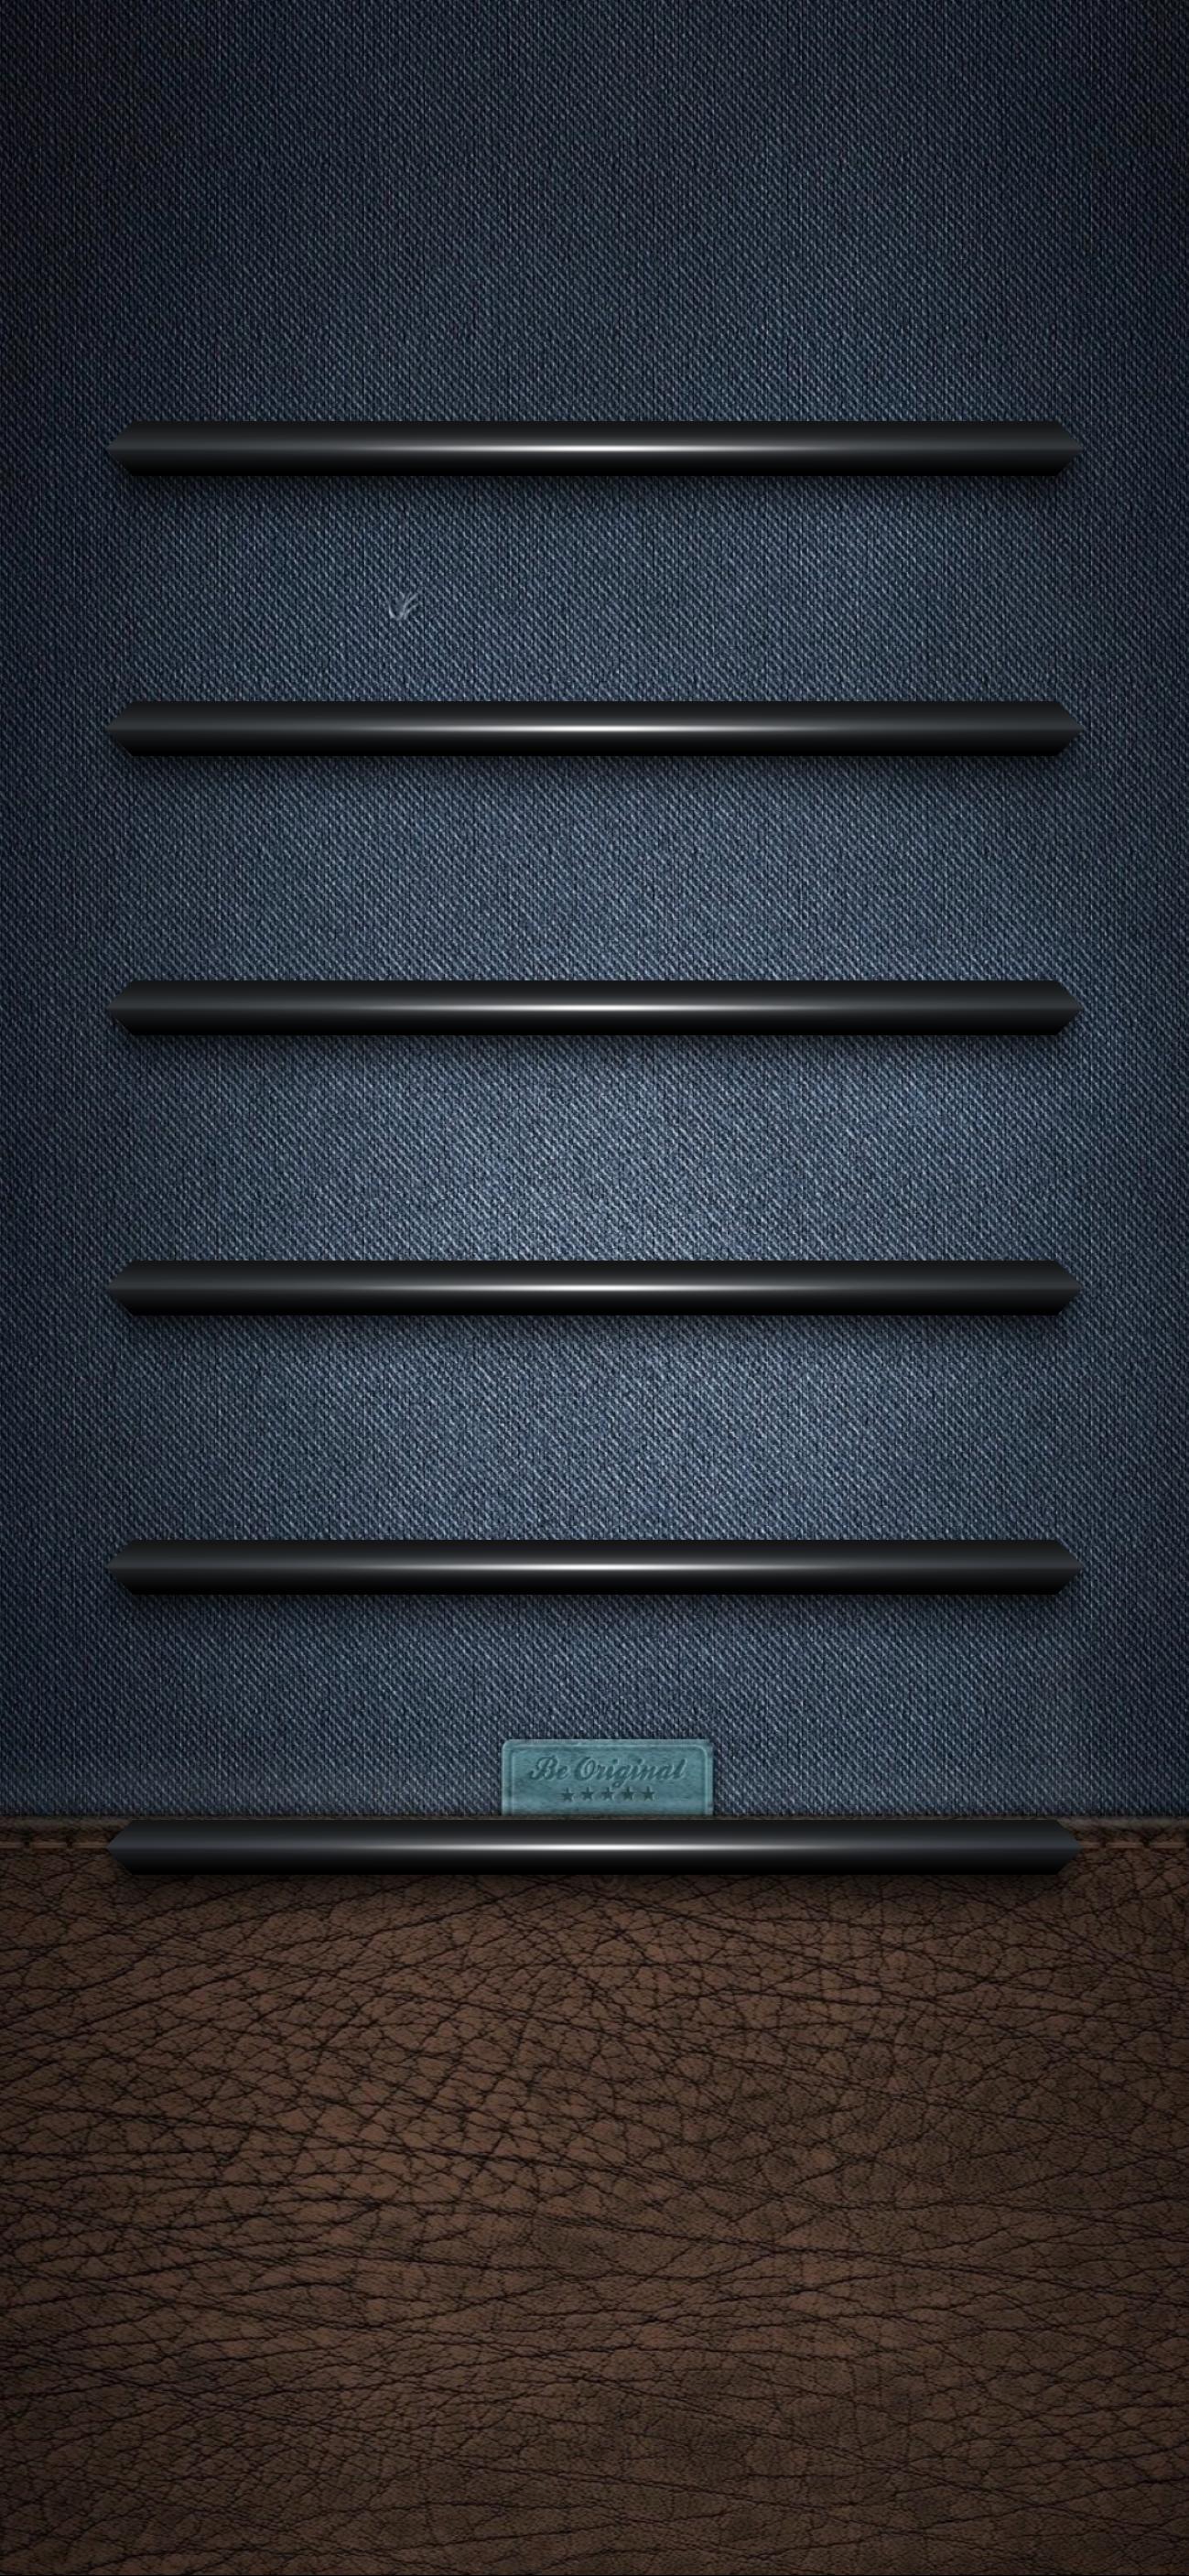 Wallpaper Iphone X 壁紙 Iphone シンプル Iphone8 壁紙 スマホ壁紙